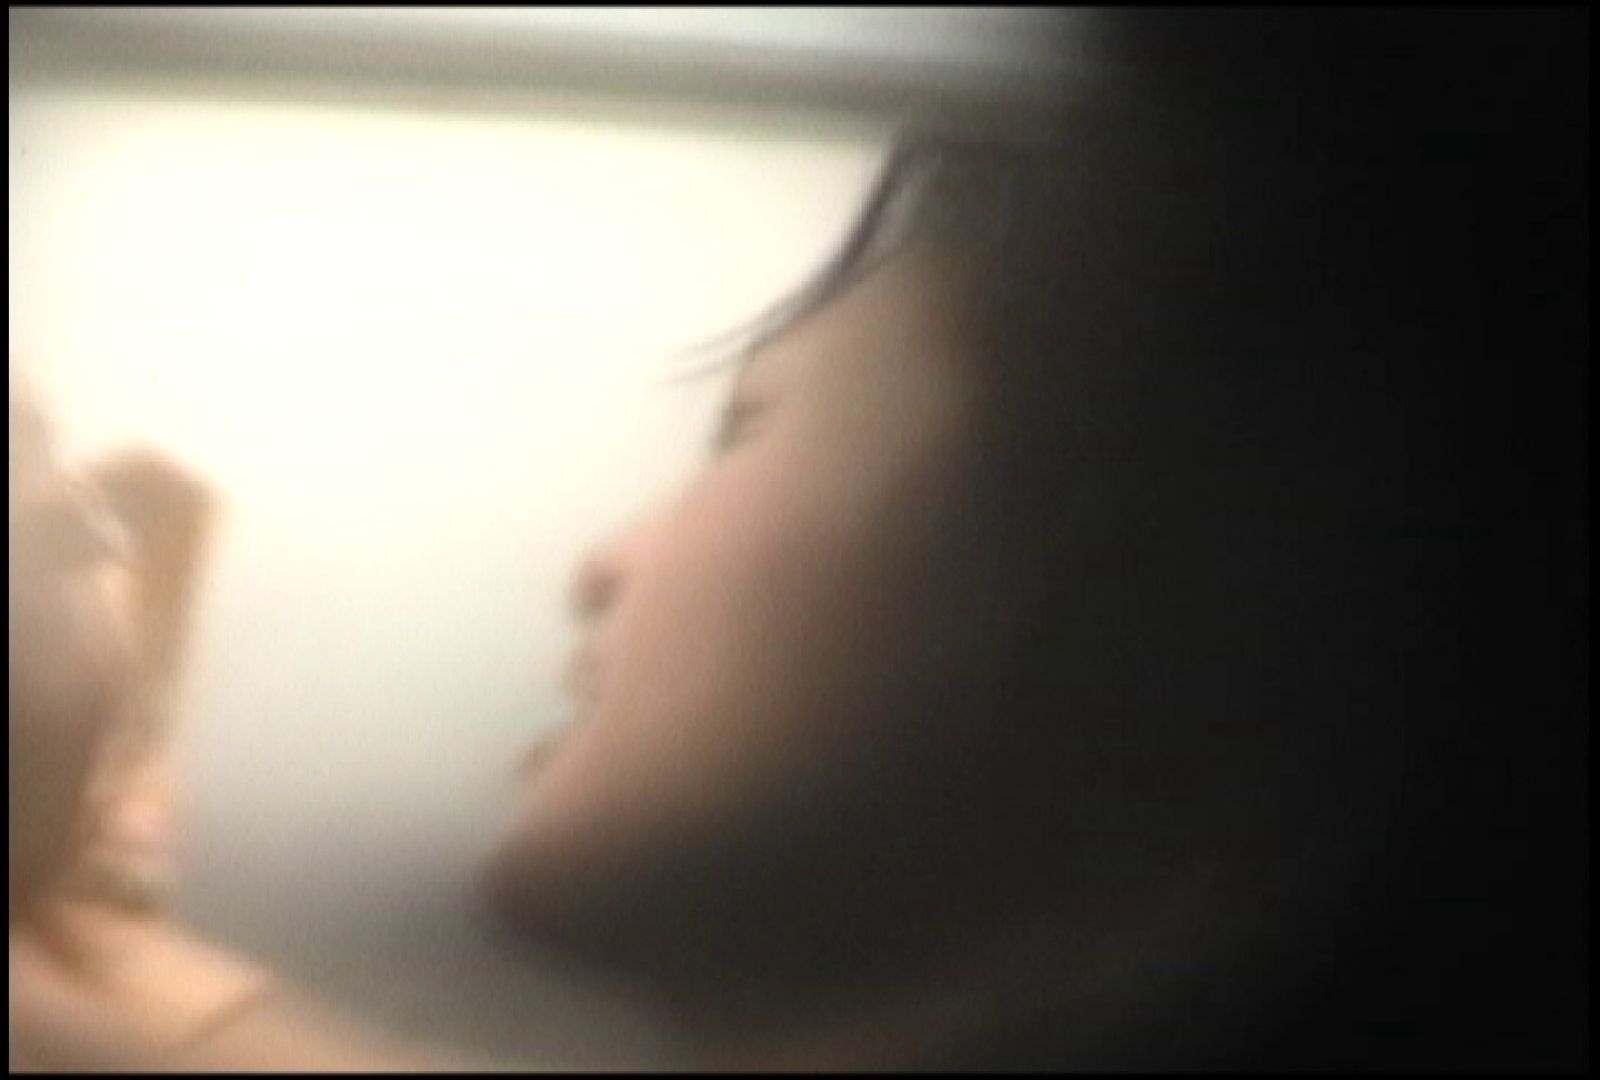 No.144 女子大生風嬢のオッパイは離れています 女子大生ハメ撮り  34Pix 34